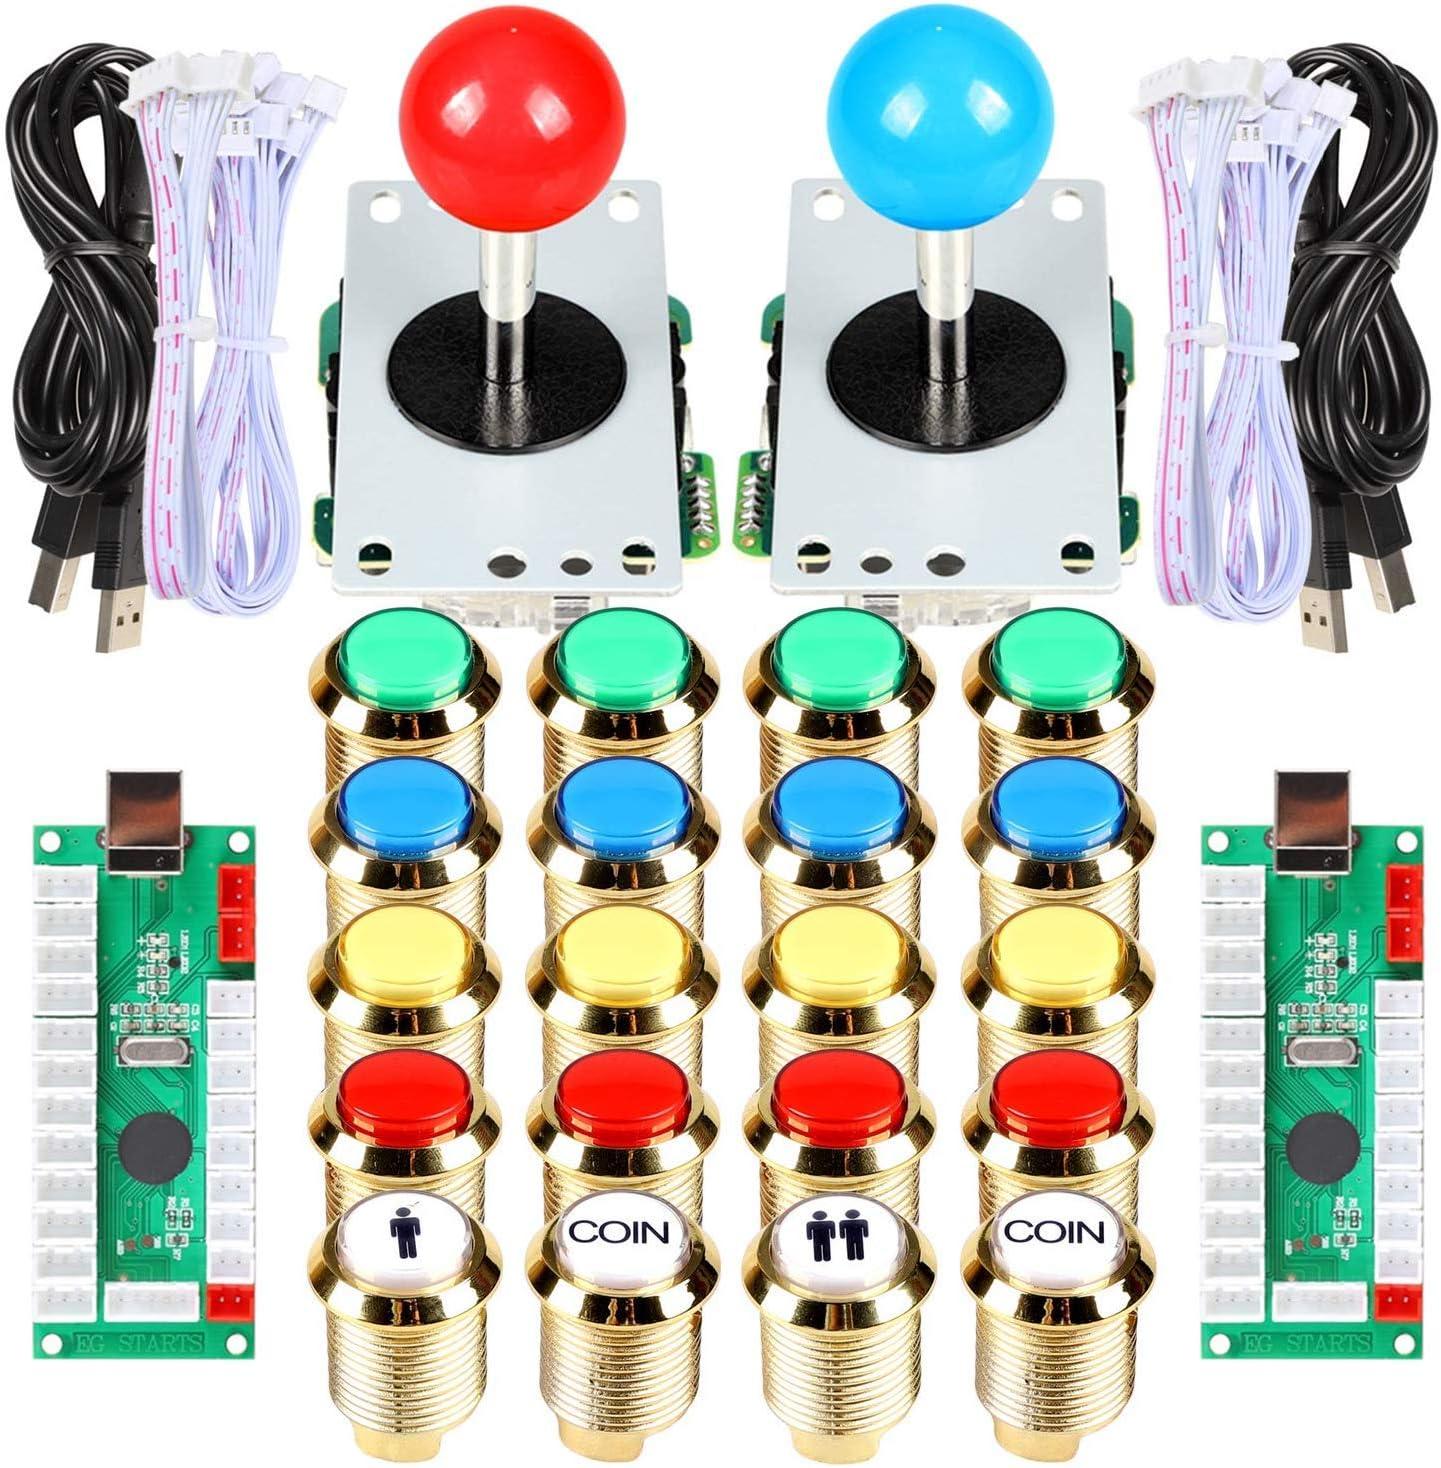 EG STARTS Classic Arcade DIY Kit Parte Set 2x 5 Pines Joystick 18x Chapado en oro LED Botón iluminado 1 2 Player Coin 30mm Botones dorados Lights para Arcade MAME & Arcade Cabinet & Raspberry